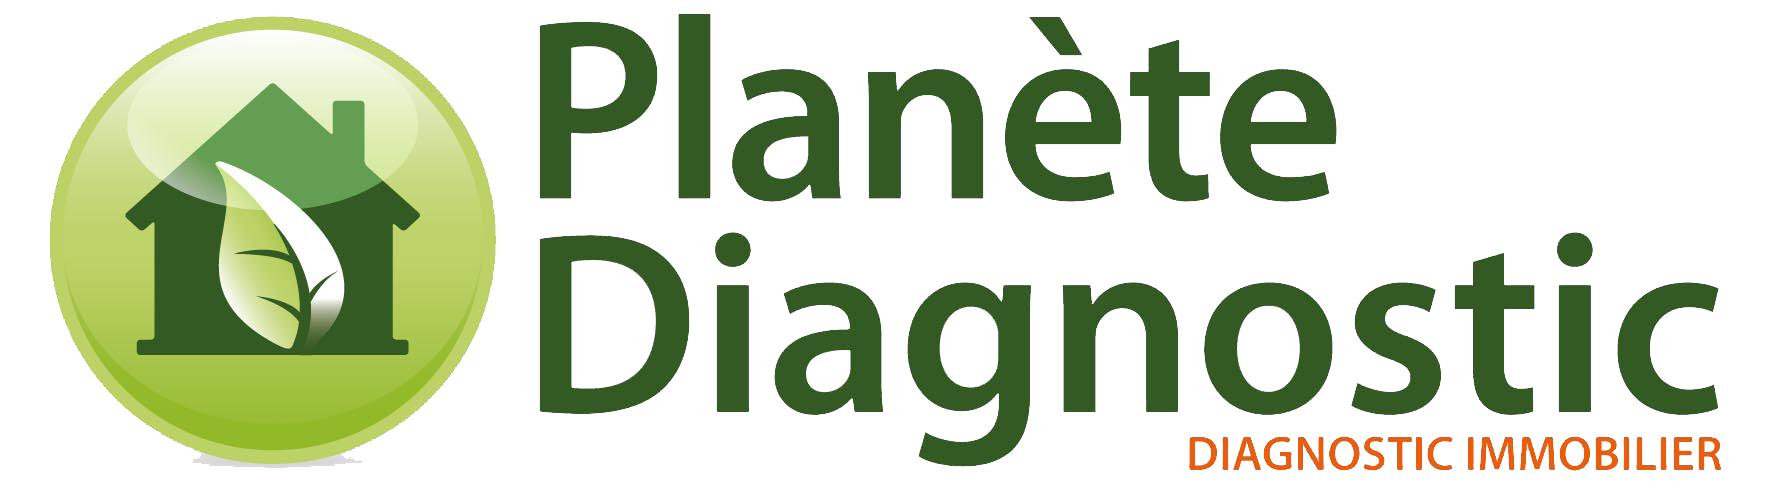 Planete diagnostic